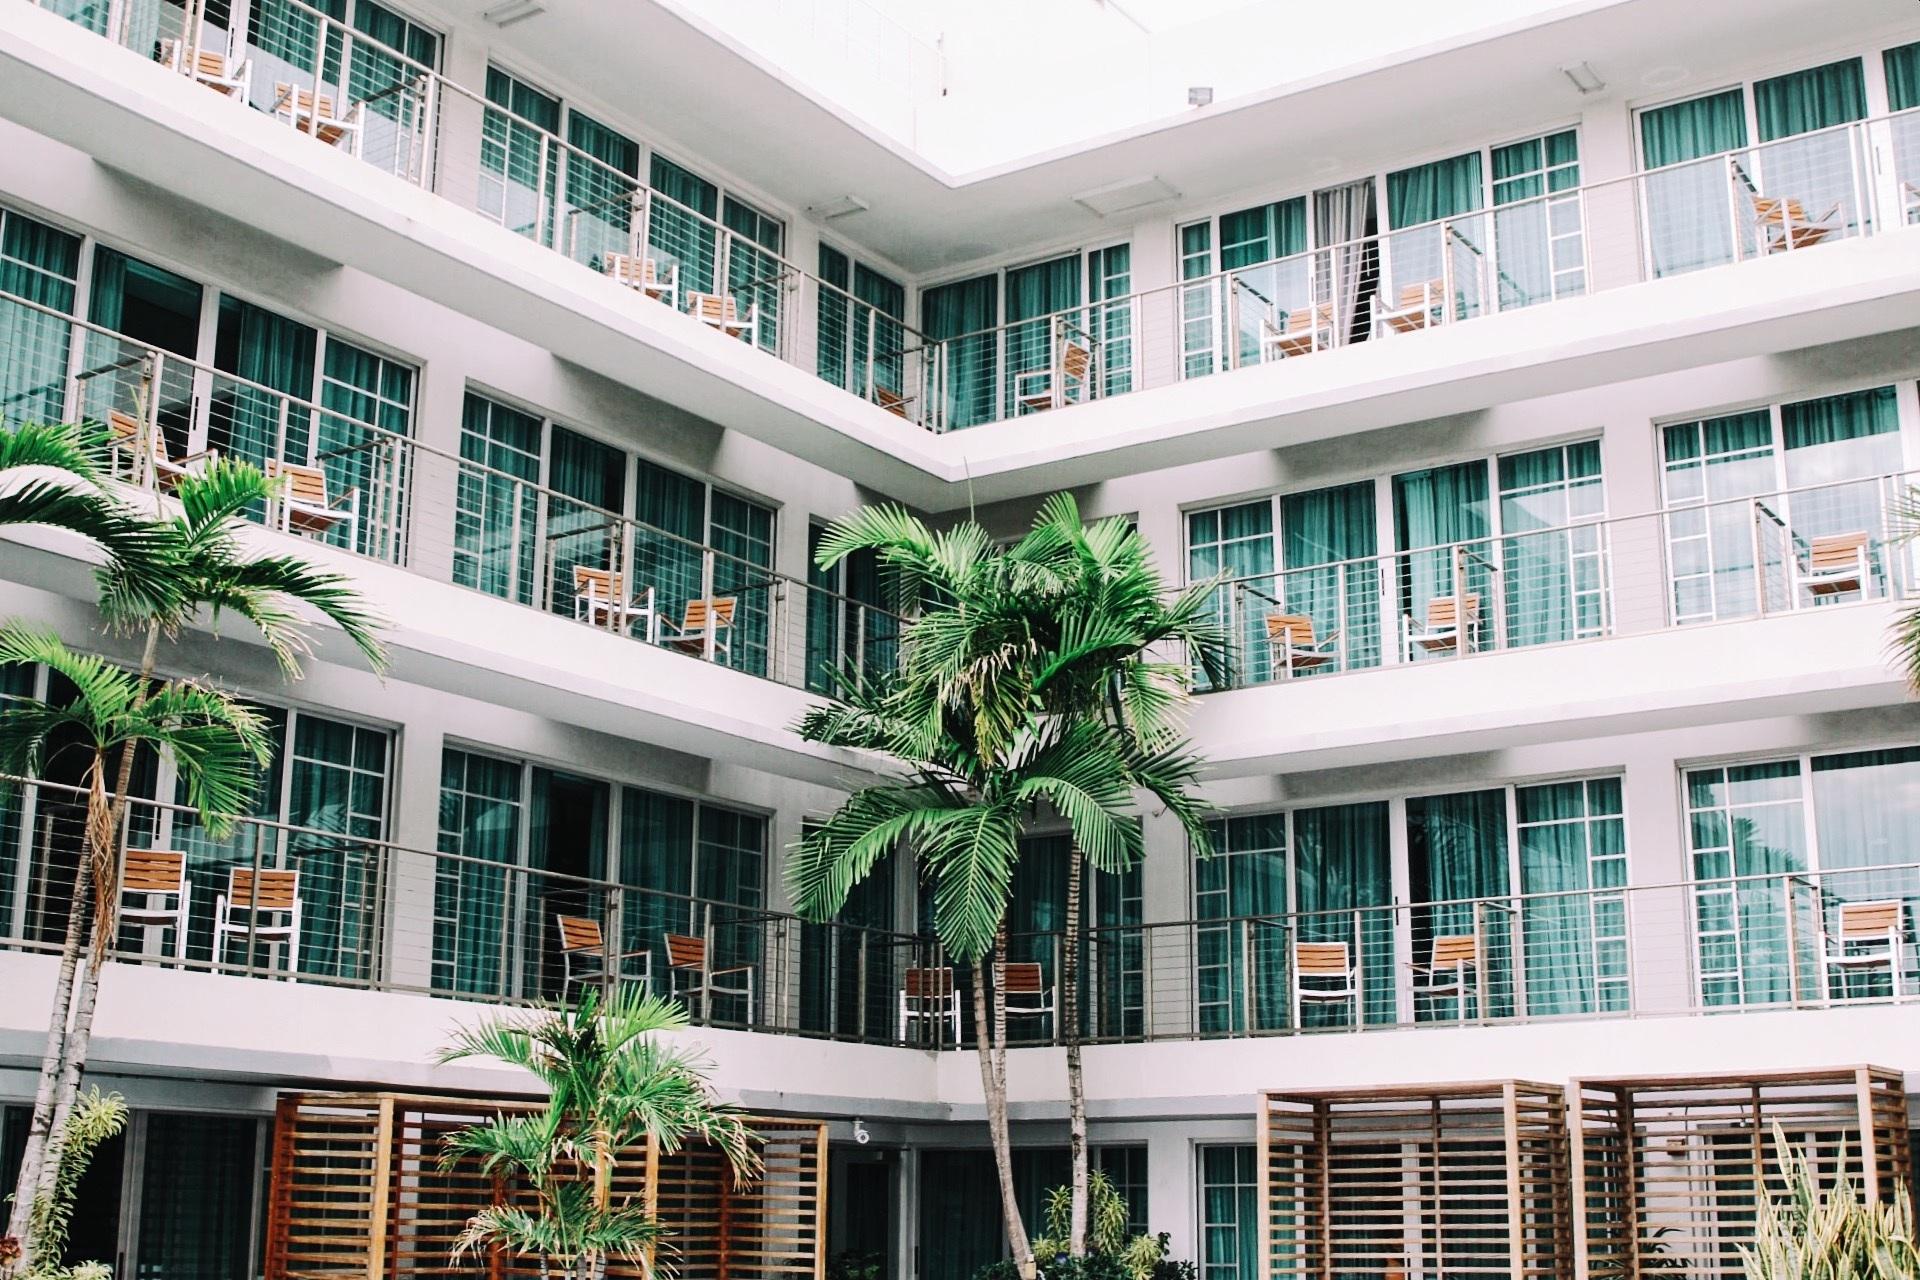 Free Images : house, building, home, tourist, balcony, plaza, facade ...